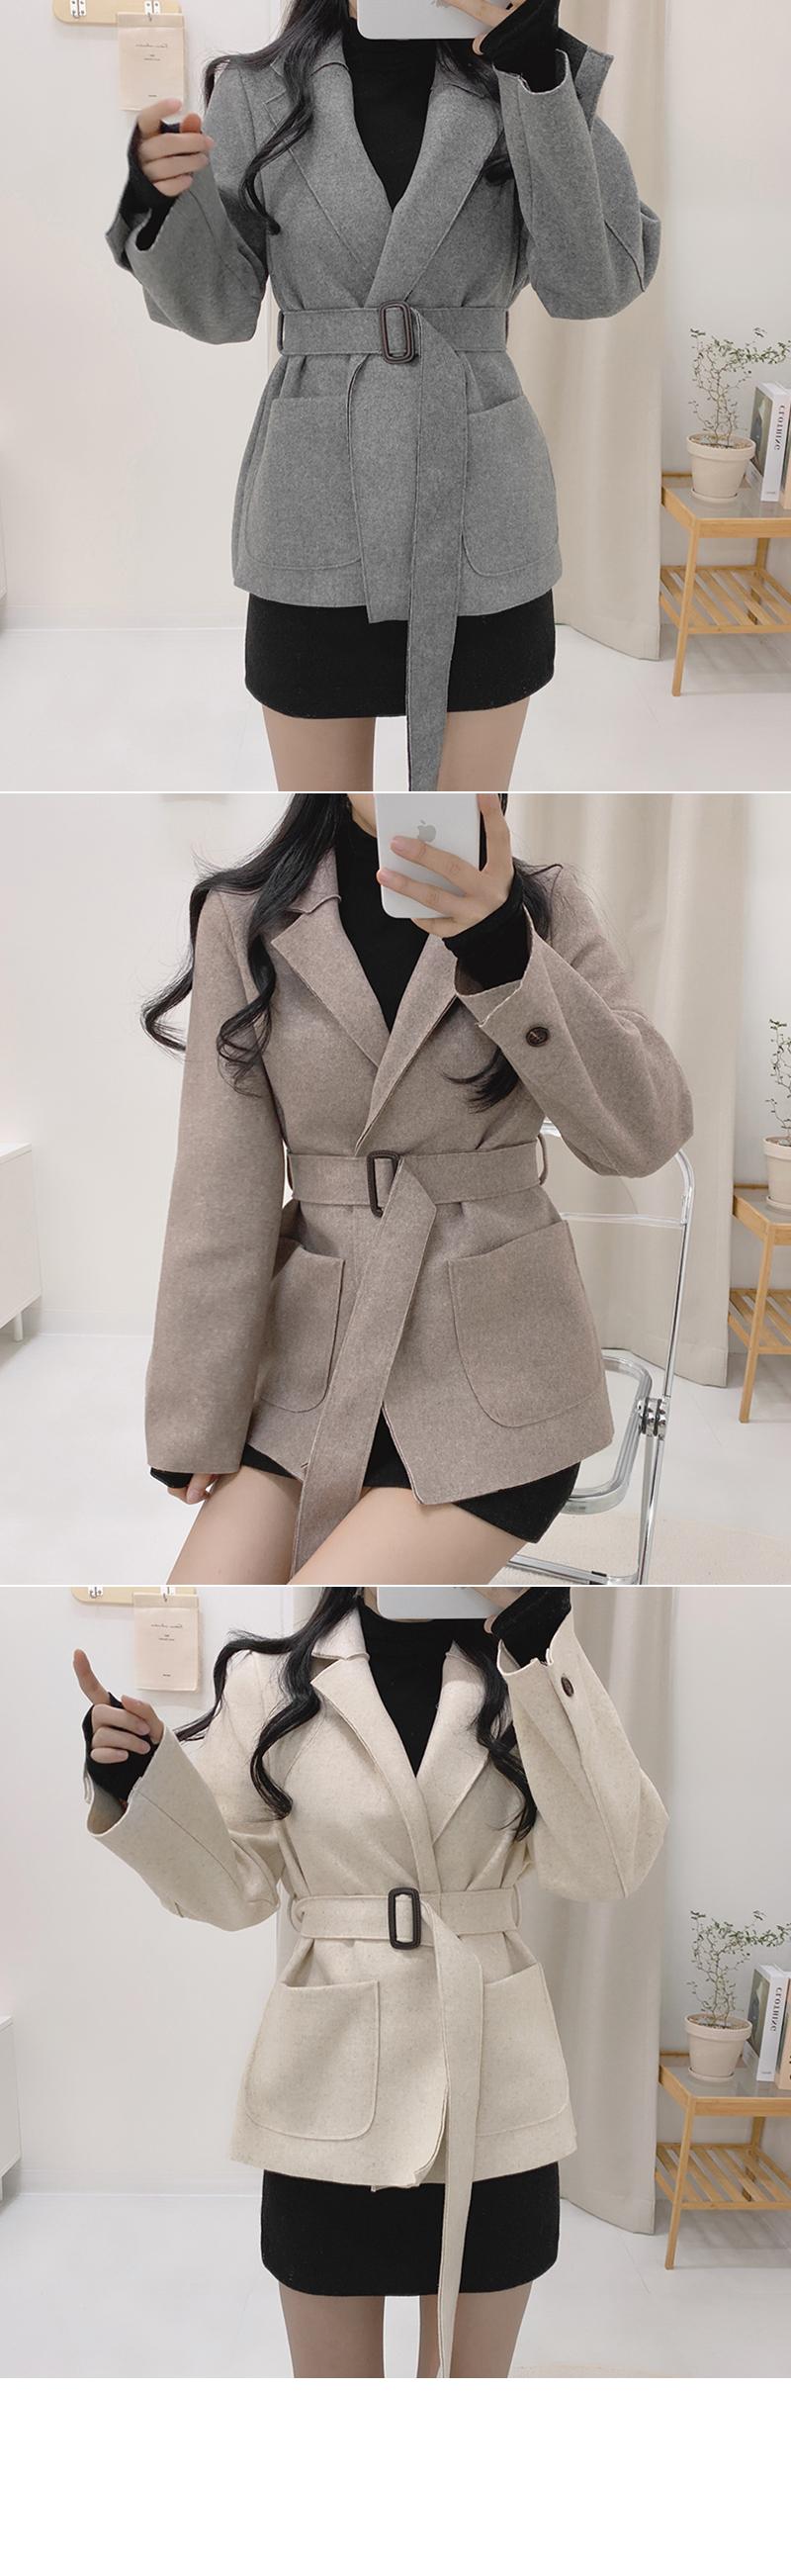 Cuming waist belt half coat jacket